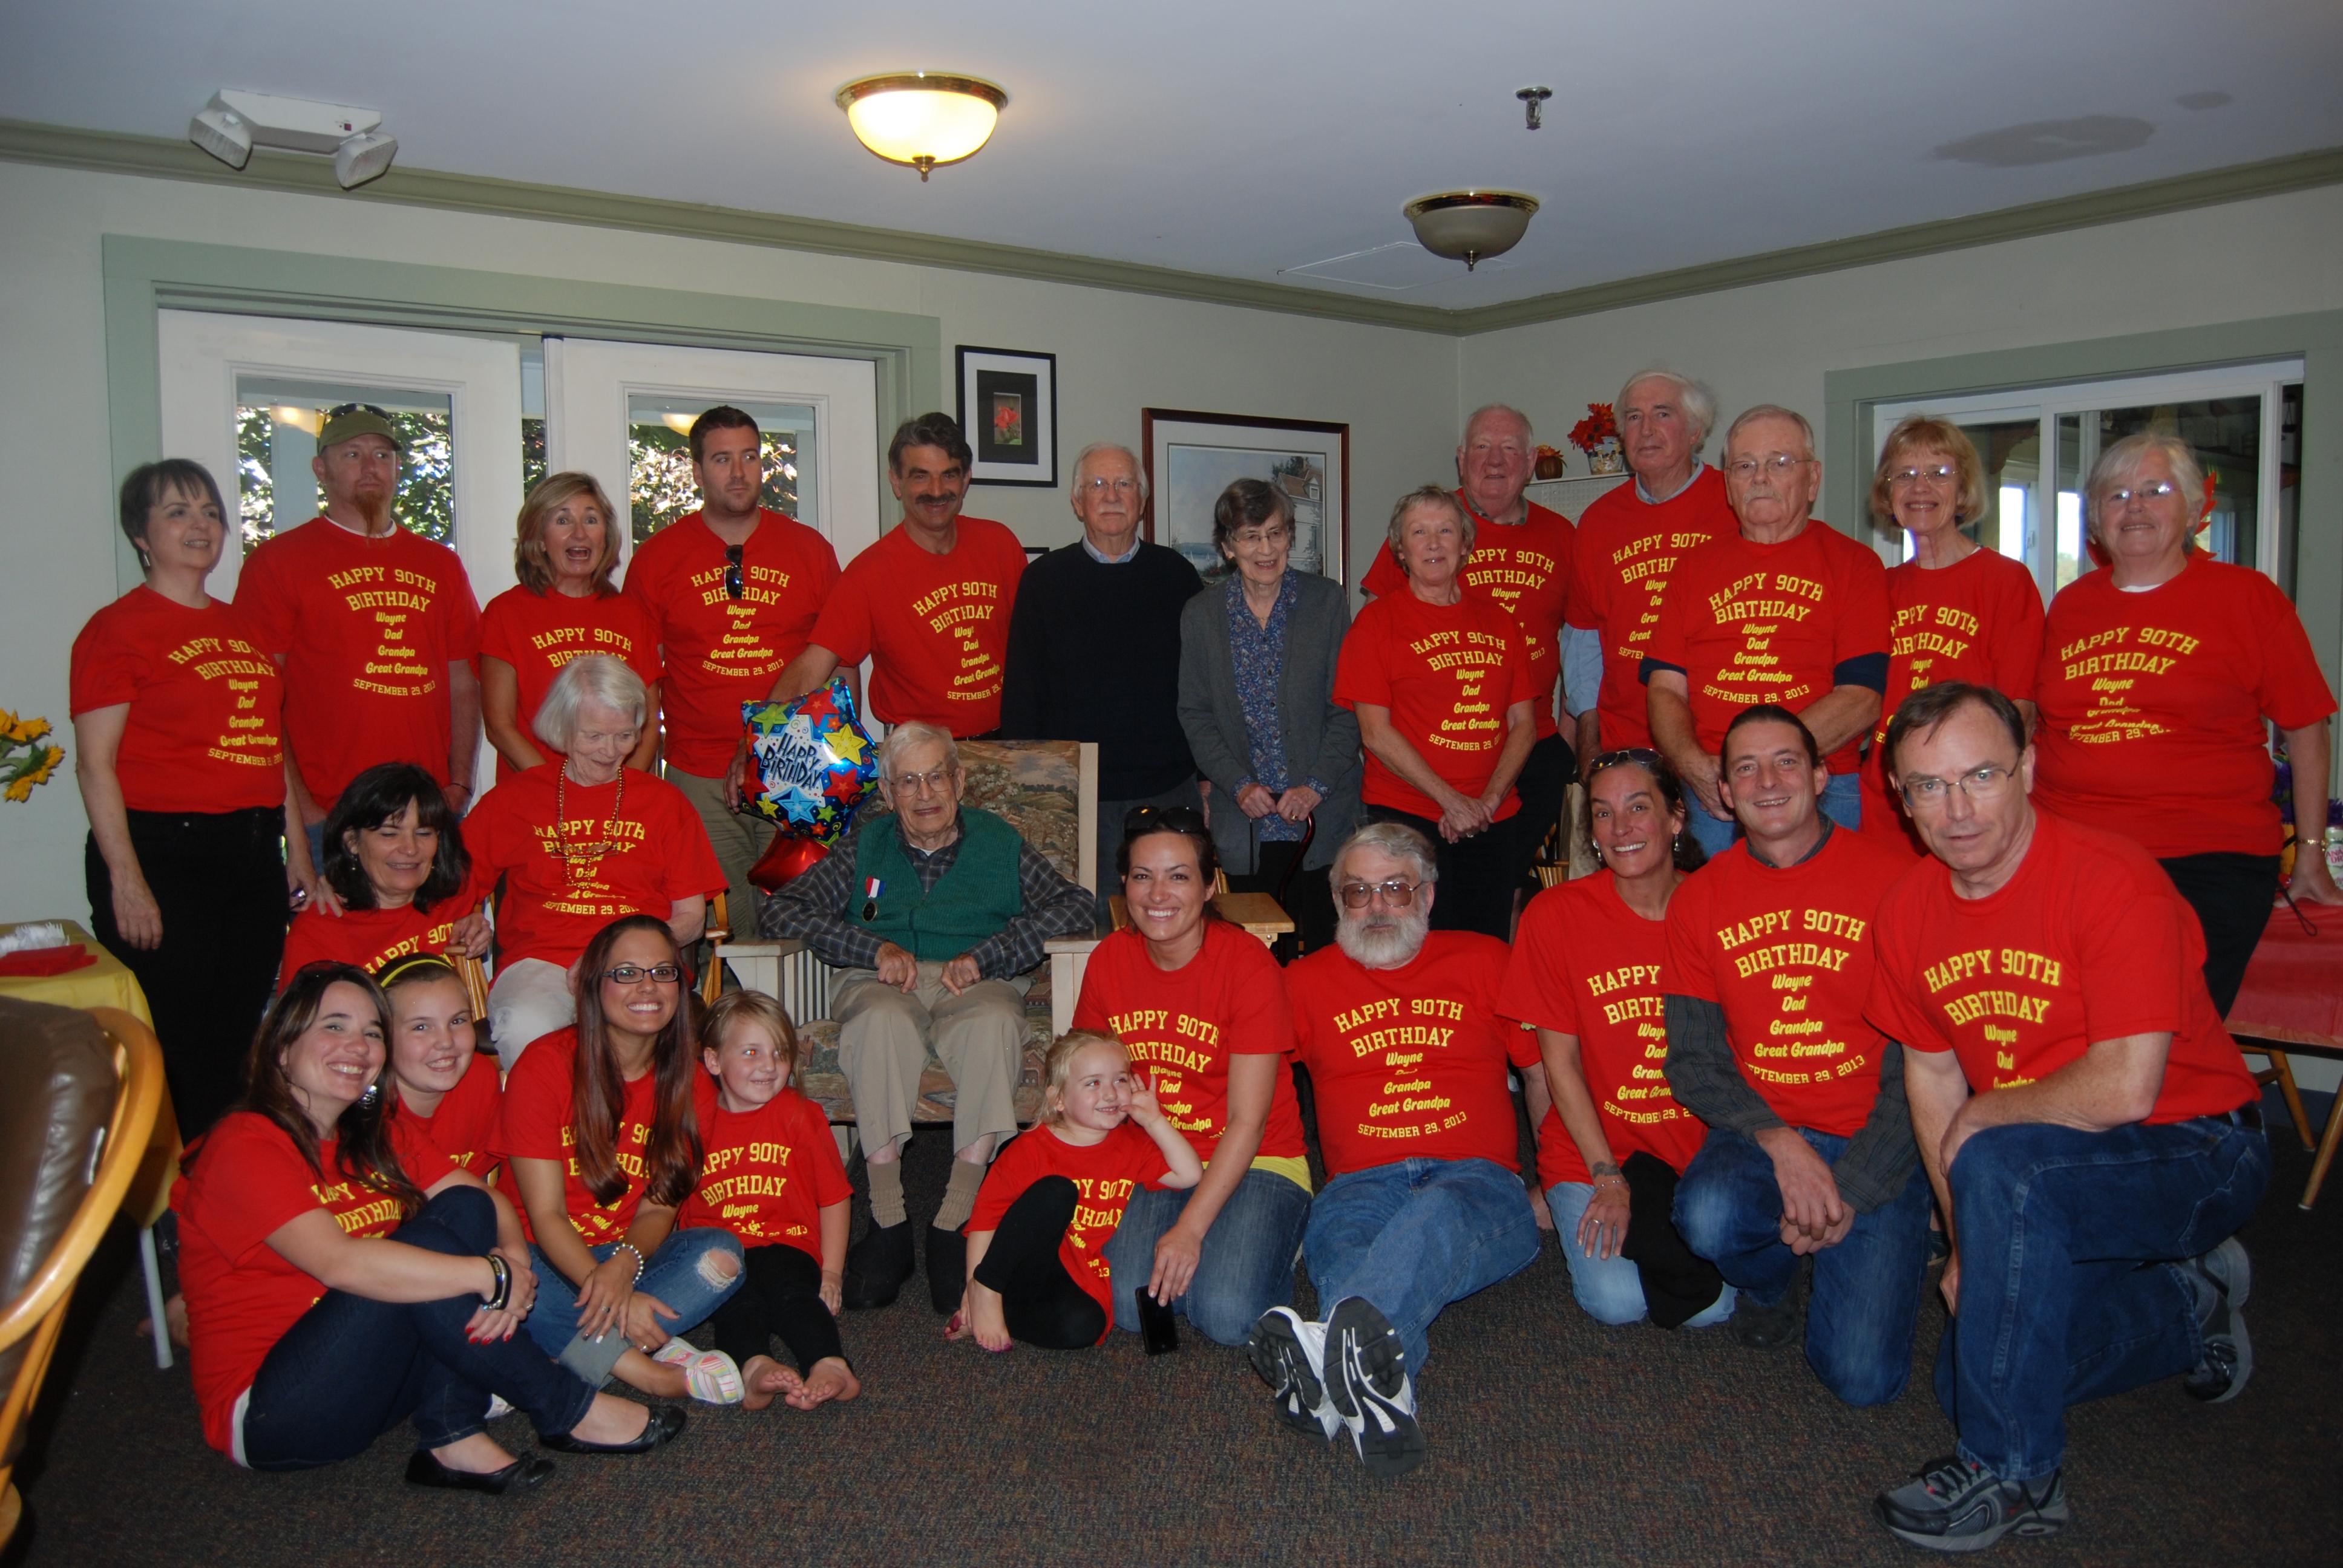 Shirt design jacksonville fl - Happy 90th Wayne Dad Uncle Wayne Grandpa And Great Grandpa T